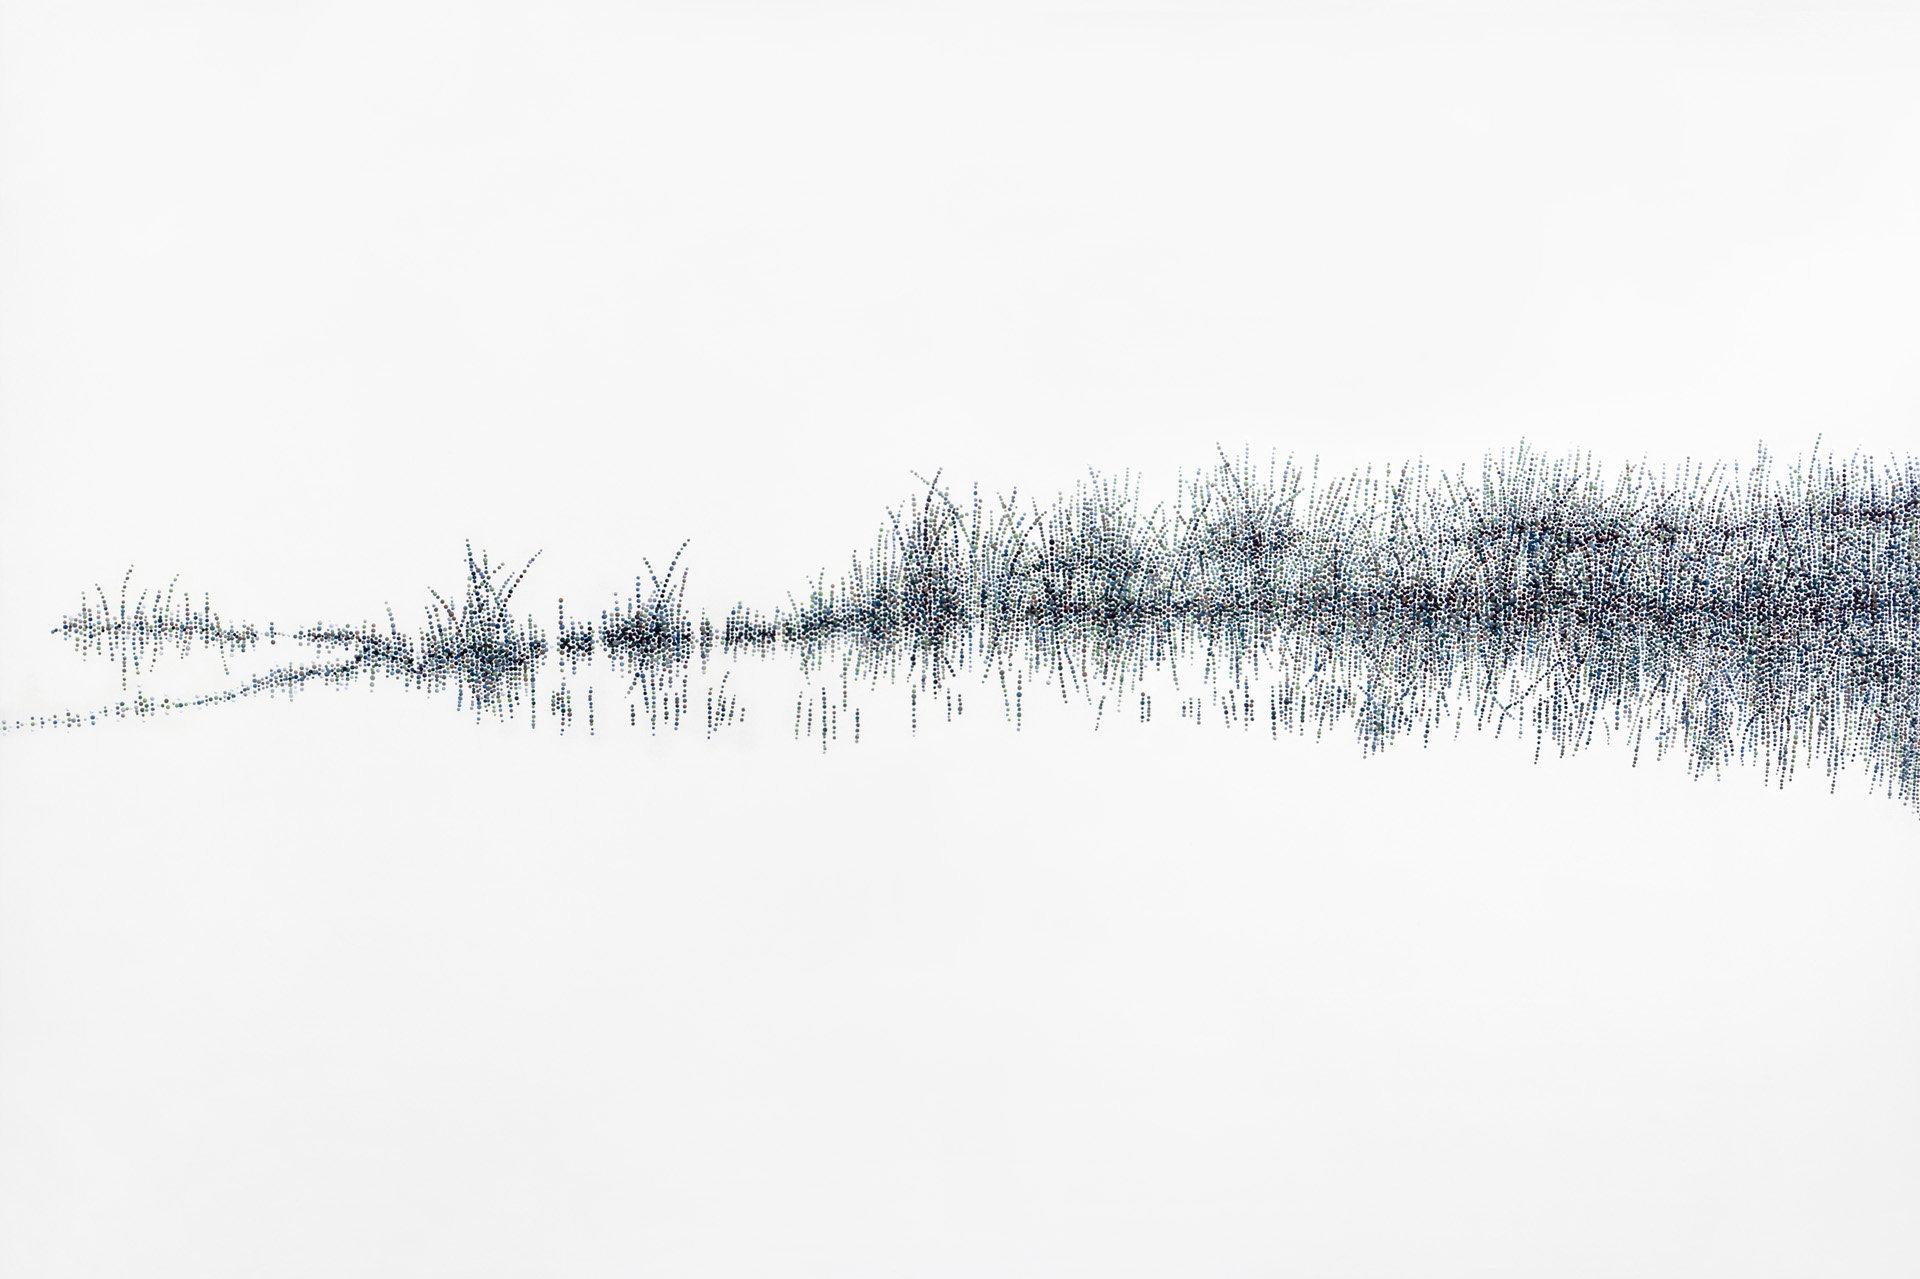 Converging Lines